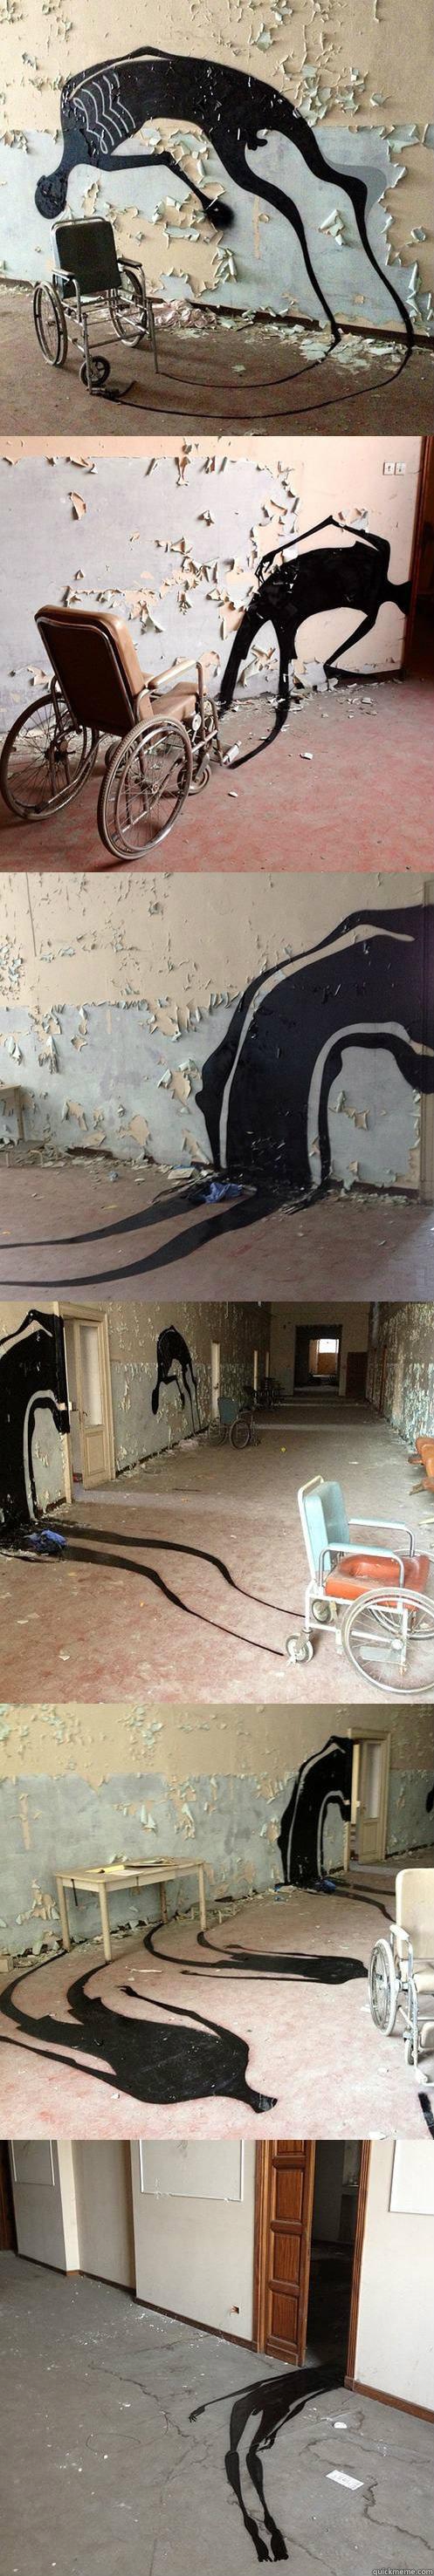 painting shadows, abandoned psychiatric hospital